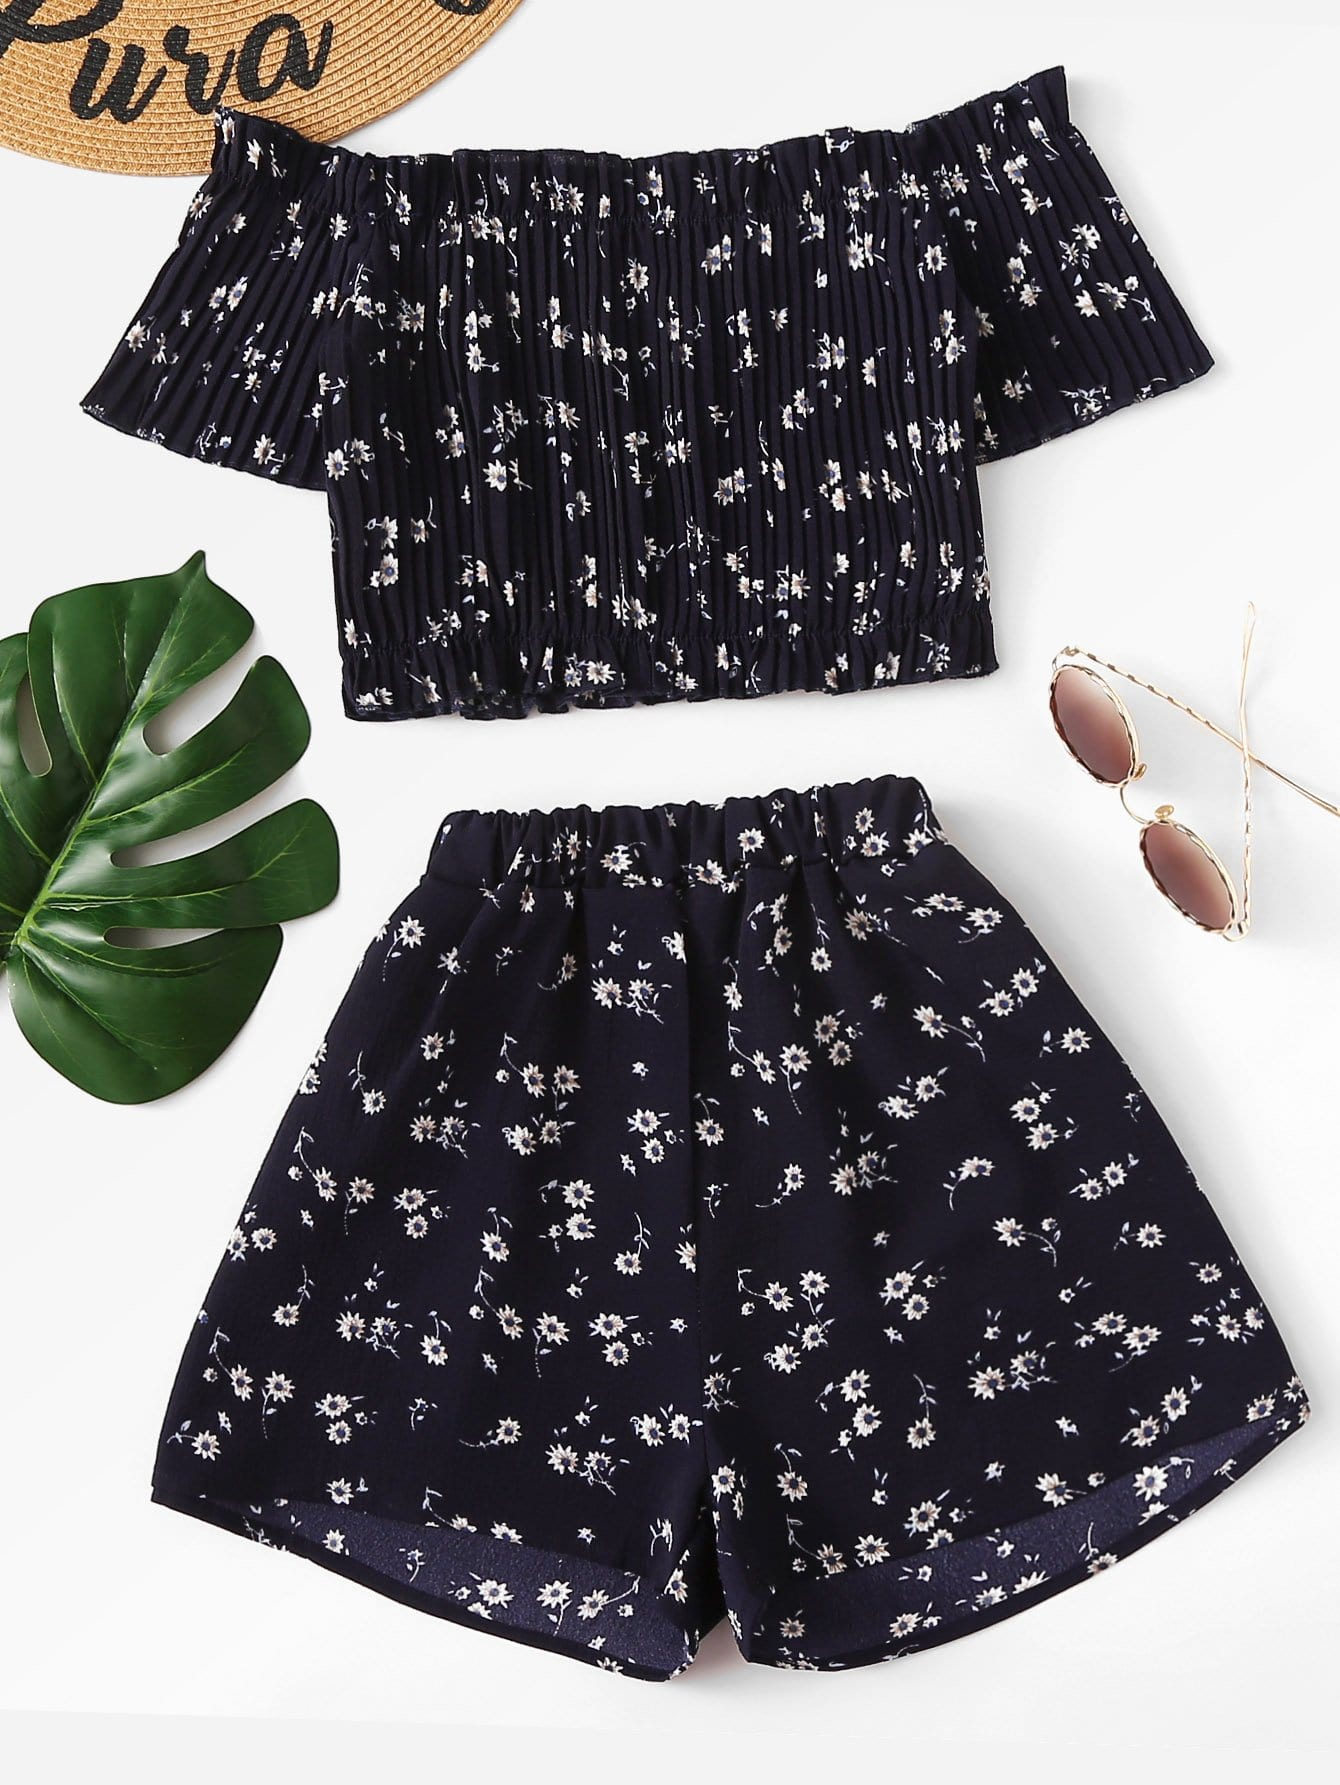 Off Shoulder Floral Crop Top With Shorts